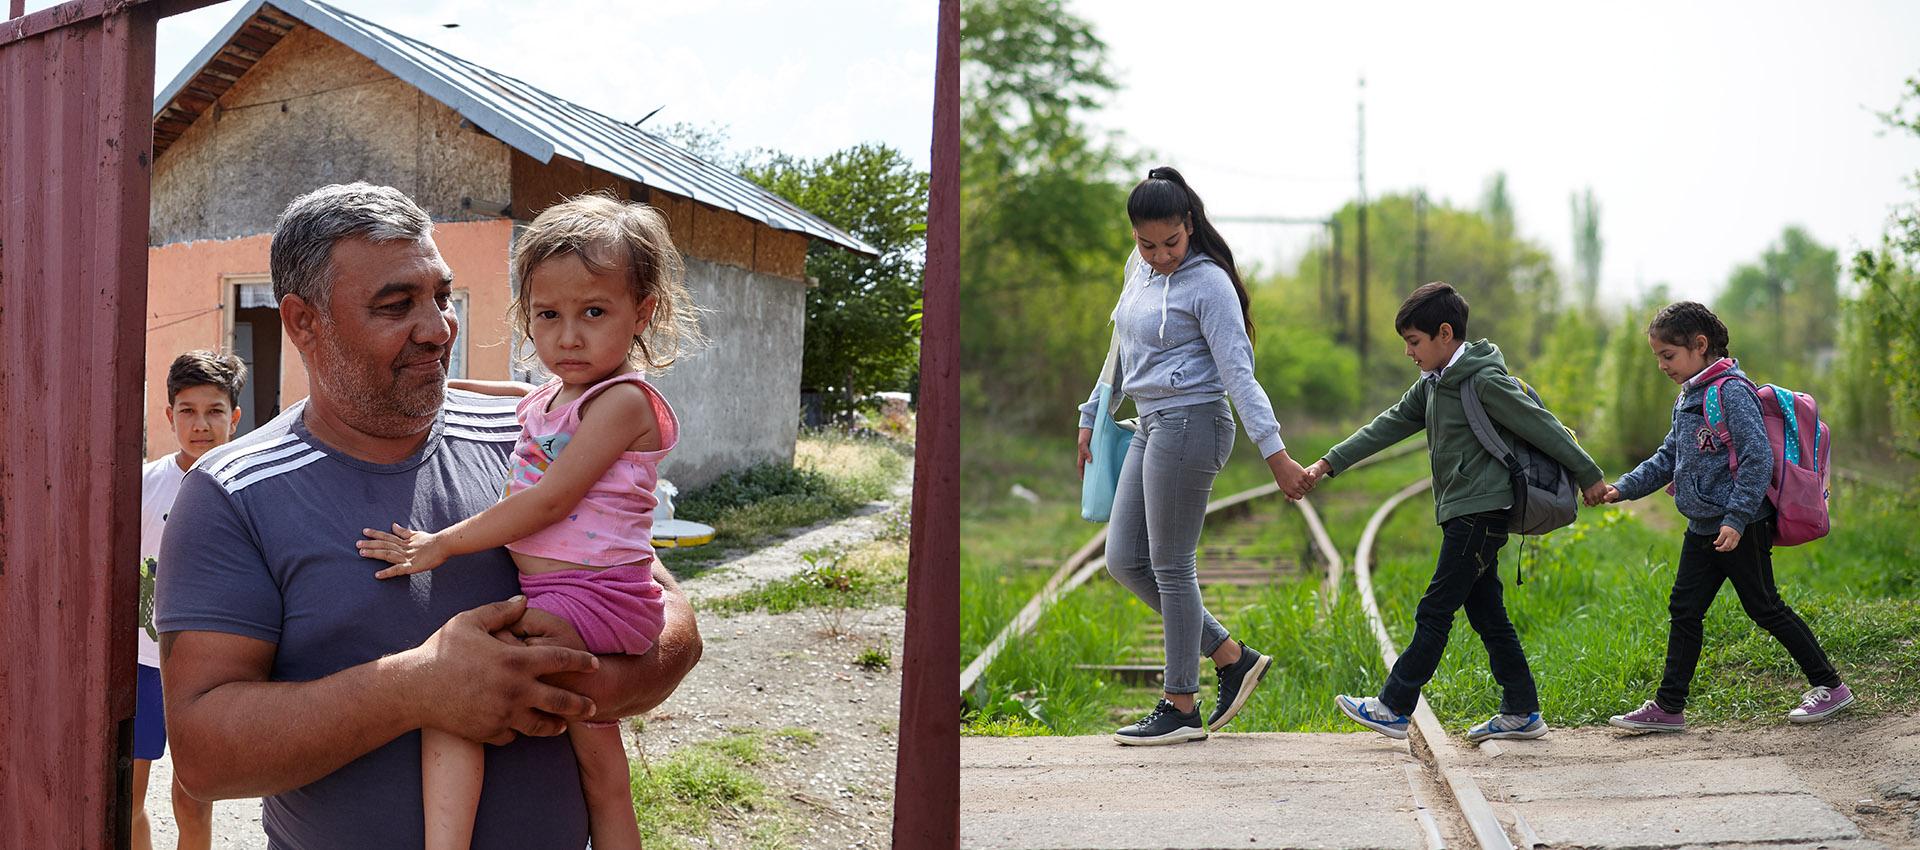 Concordia: for the future of children in neglected regions